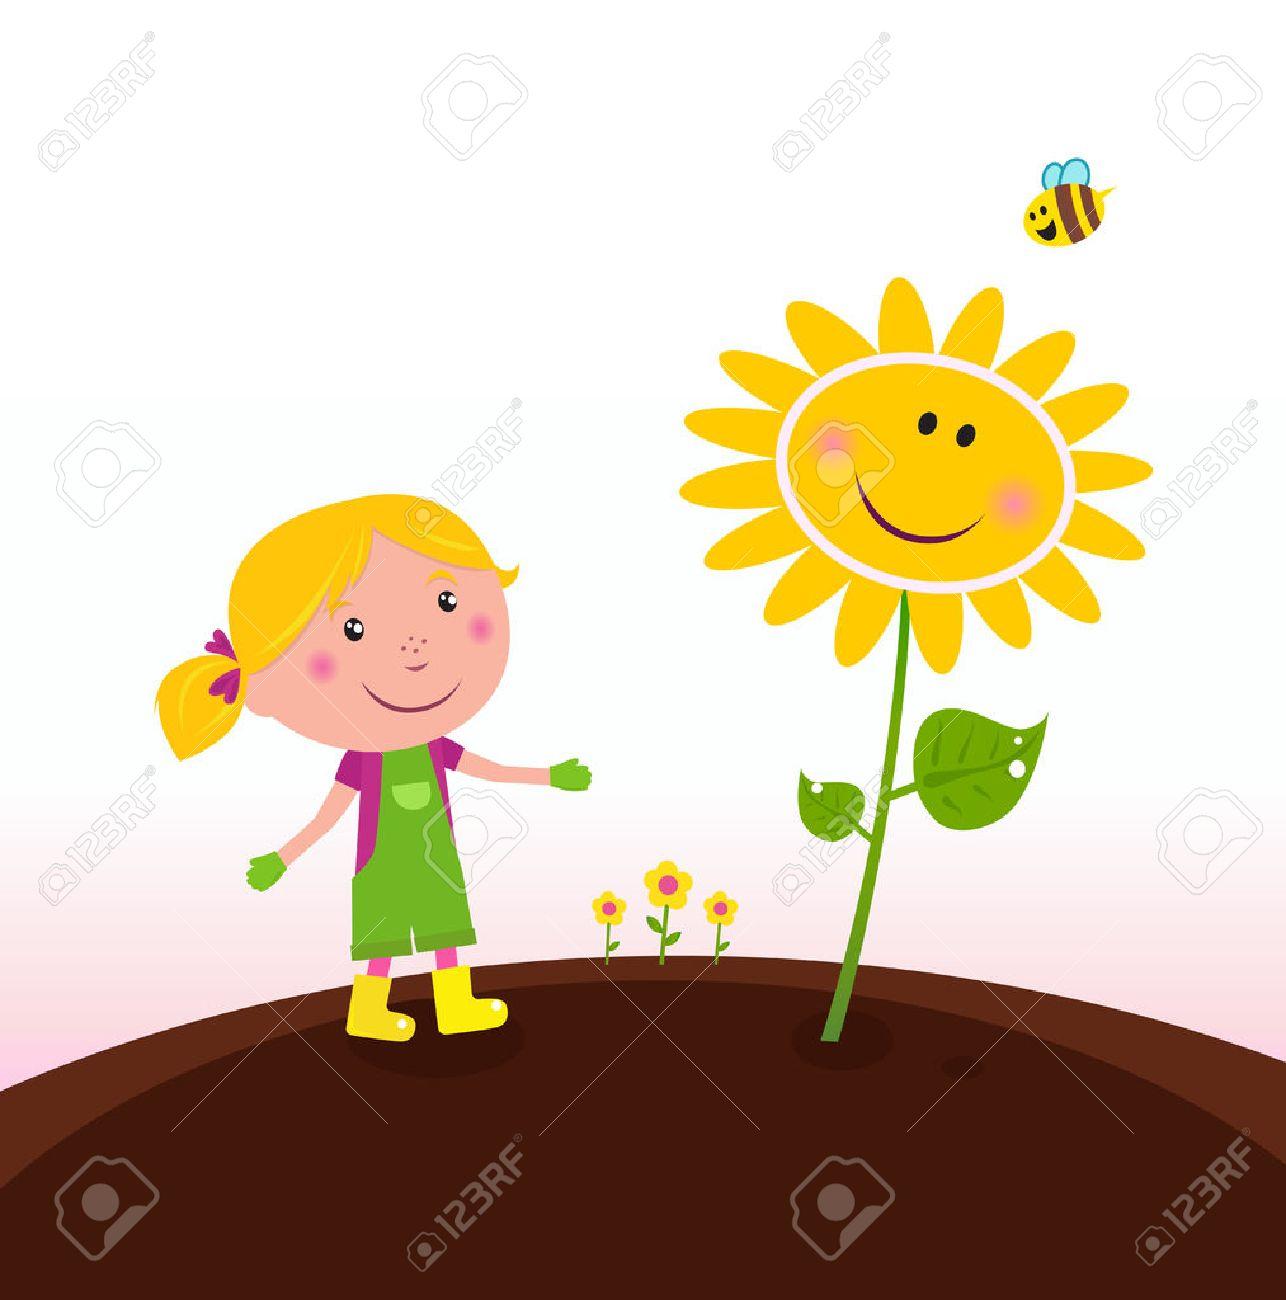 Spring gardening : Gardener child with sunflower in the garden Stock Vector - 9063581